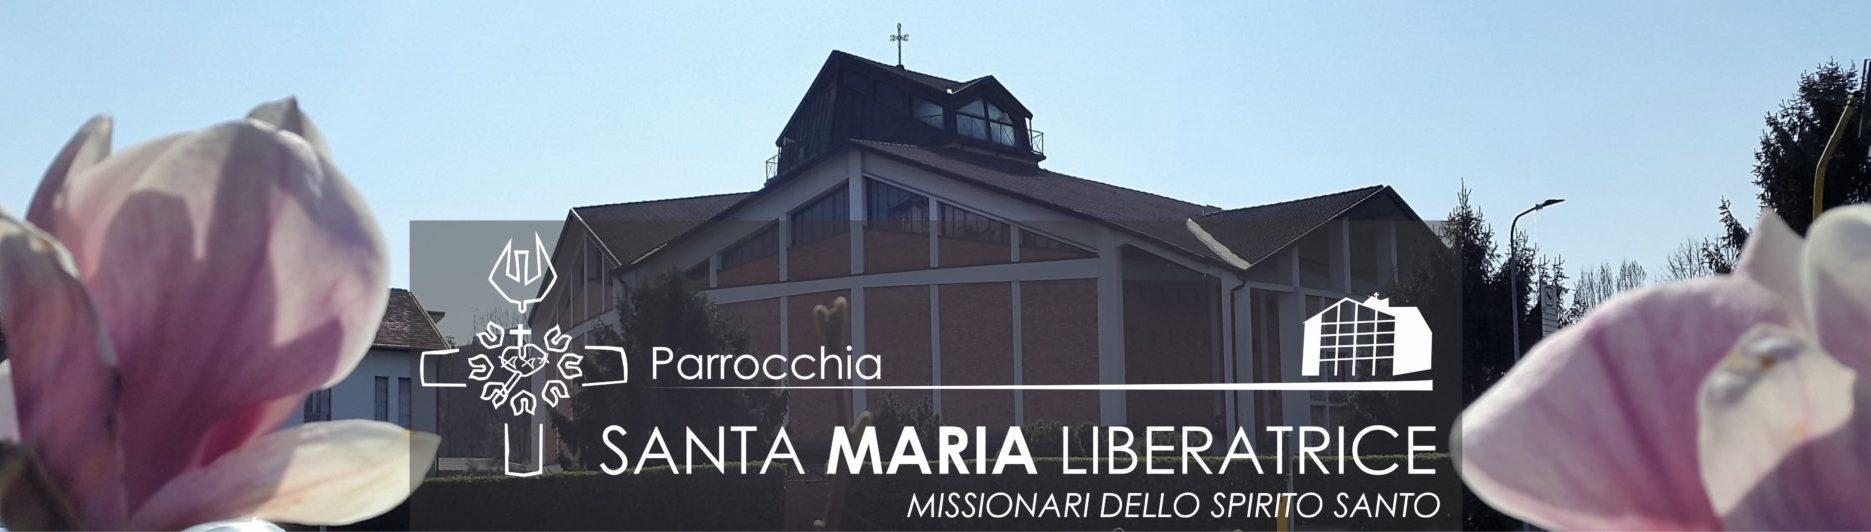 Parrocchia Santa Maria Liberatrice